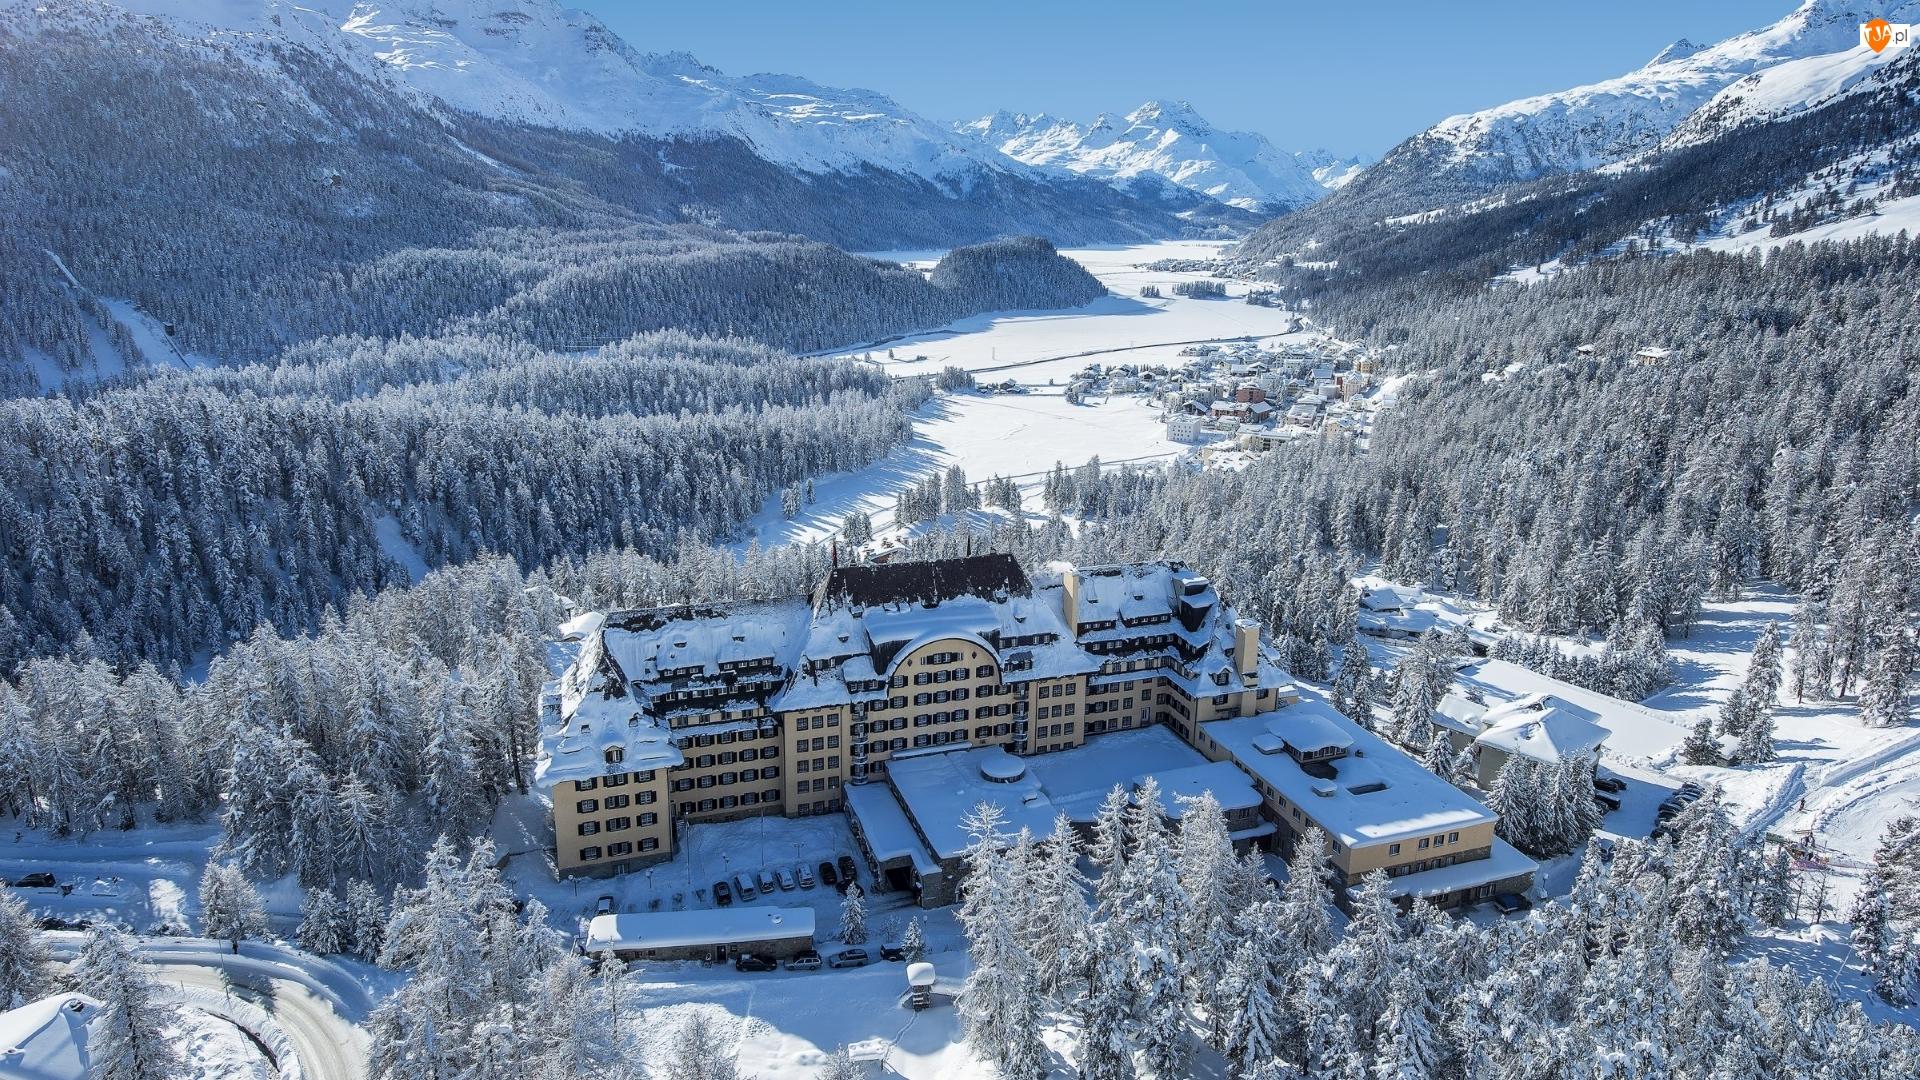 Dolina Engadine, Hotel, Góry, Sankt Moritz, Suvretta House, Lasy, Szwajcaria, Zima